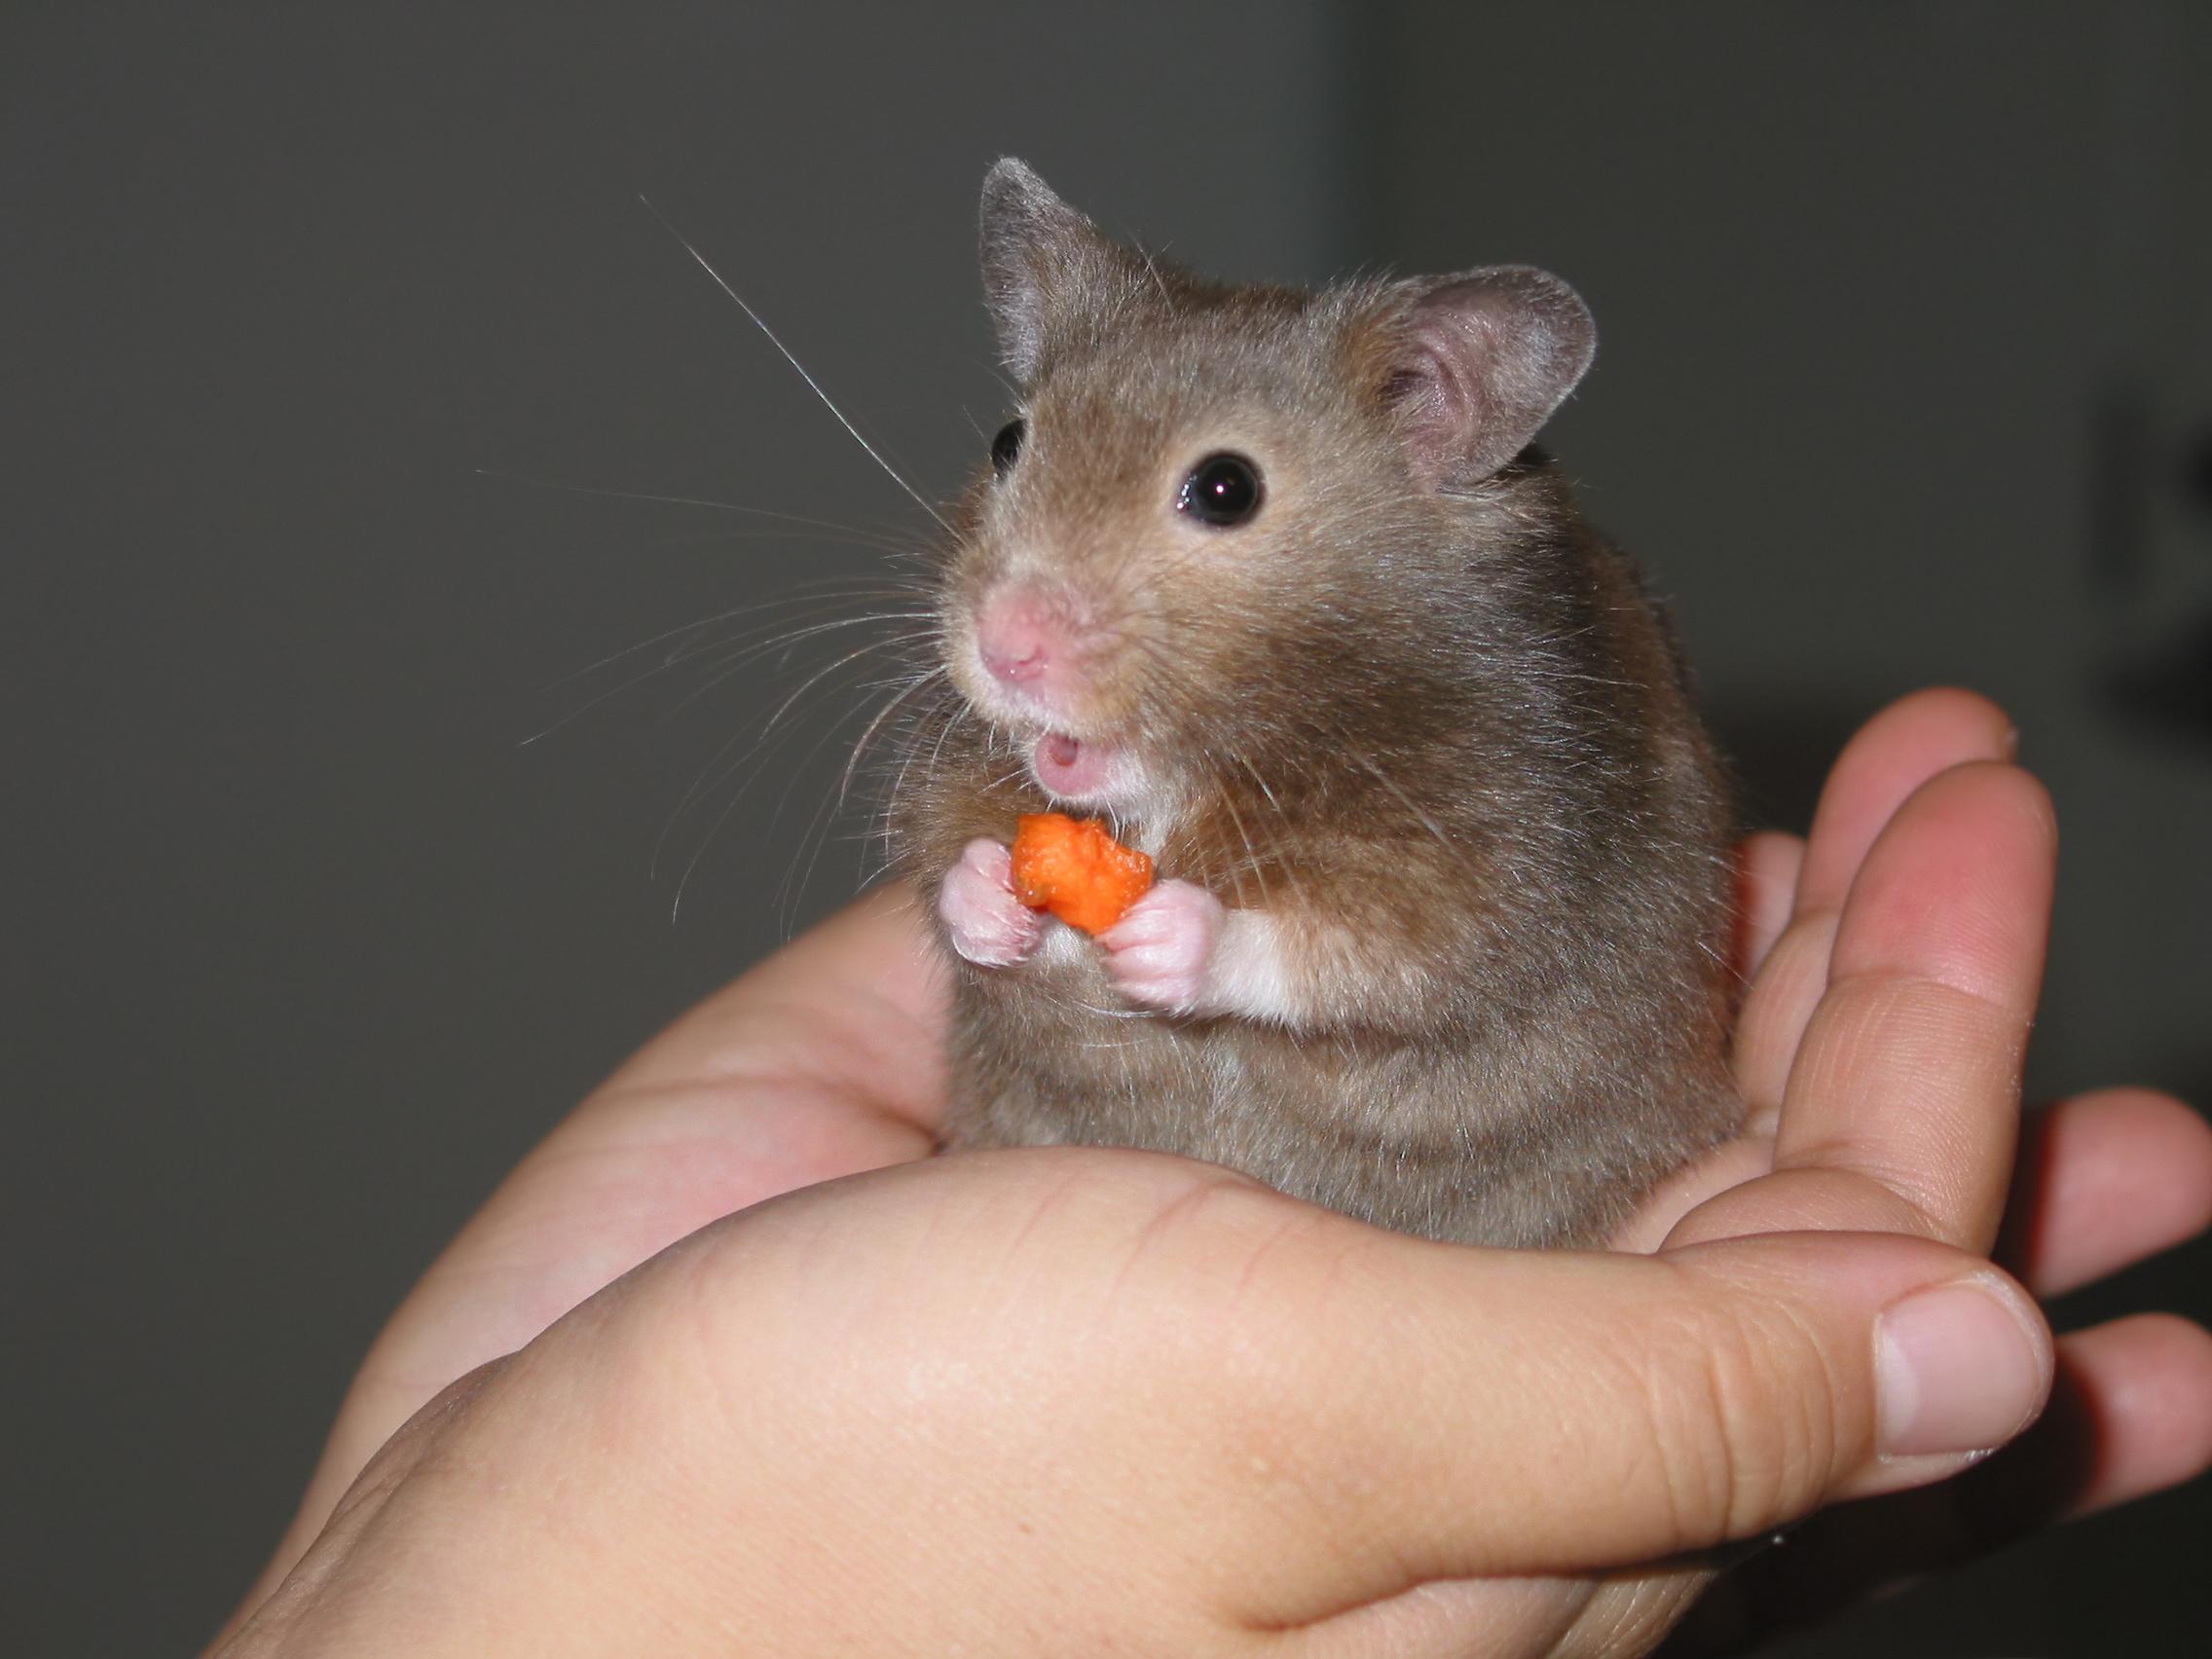 File:Hamster in hand.jpg